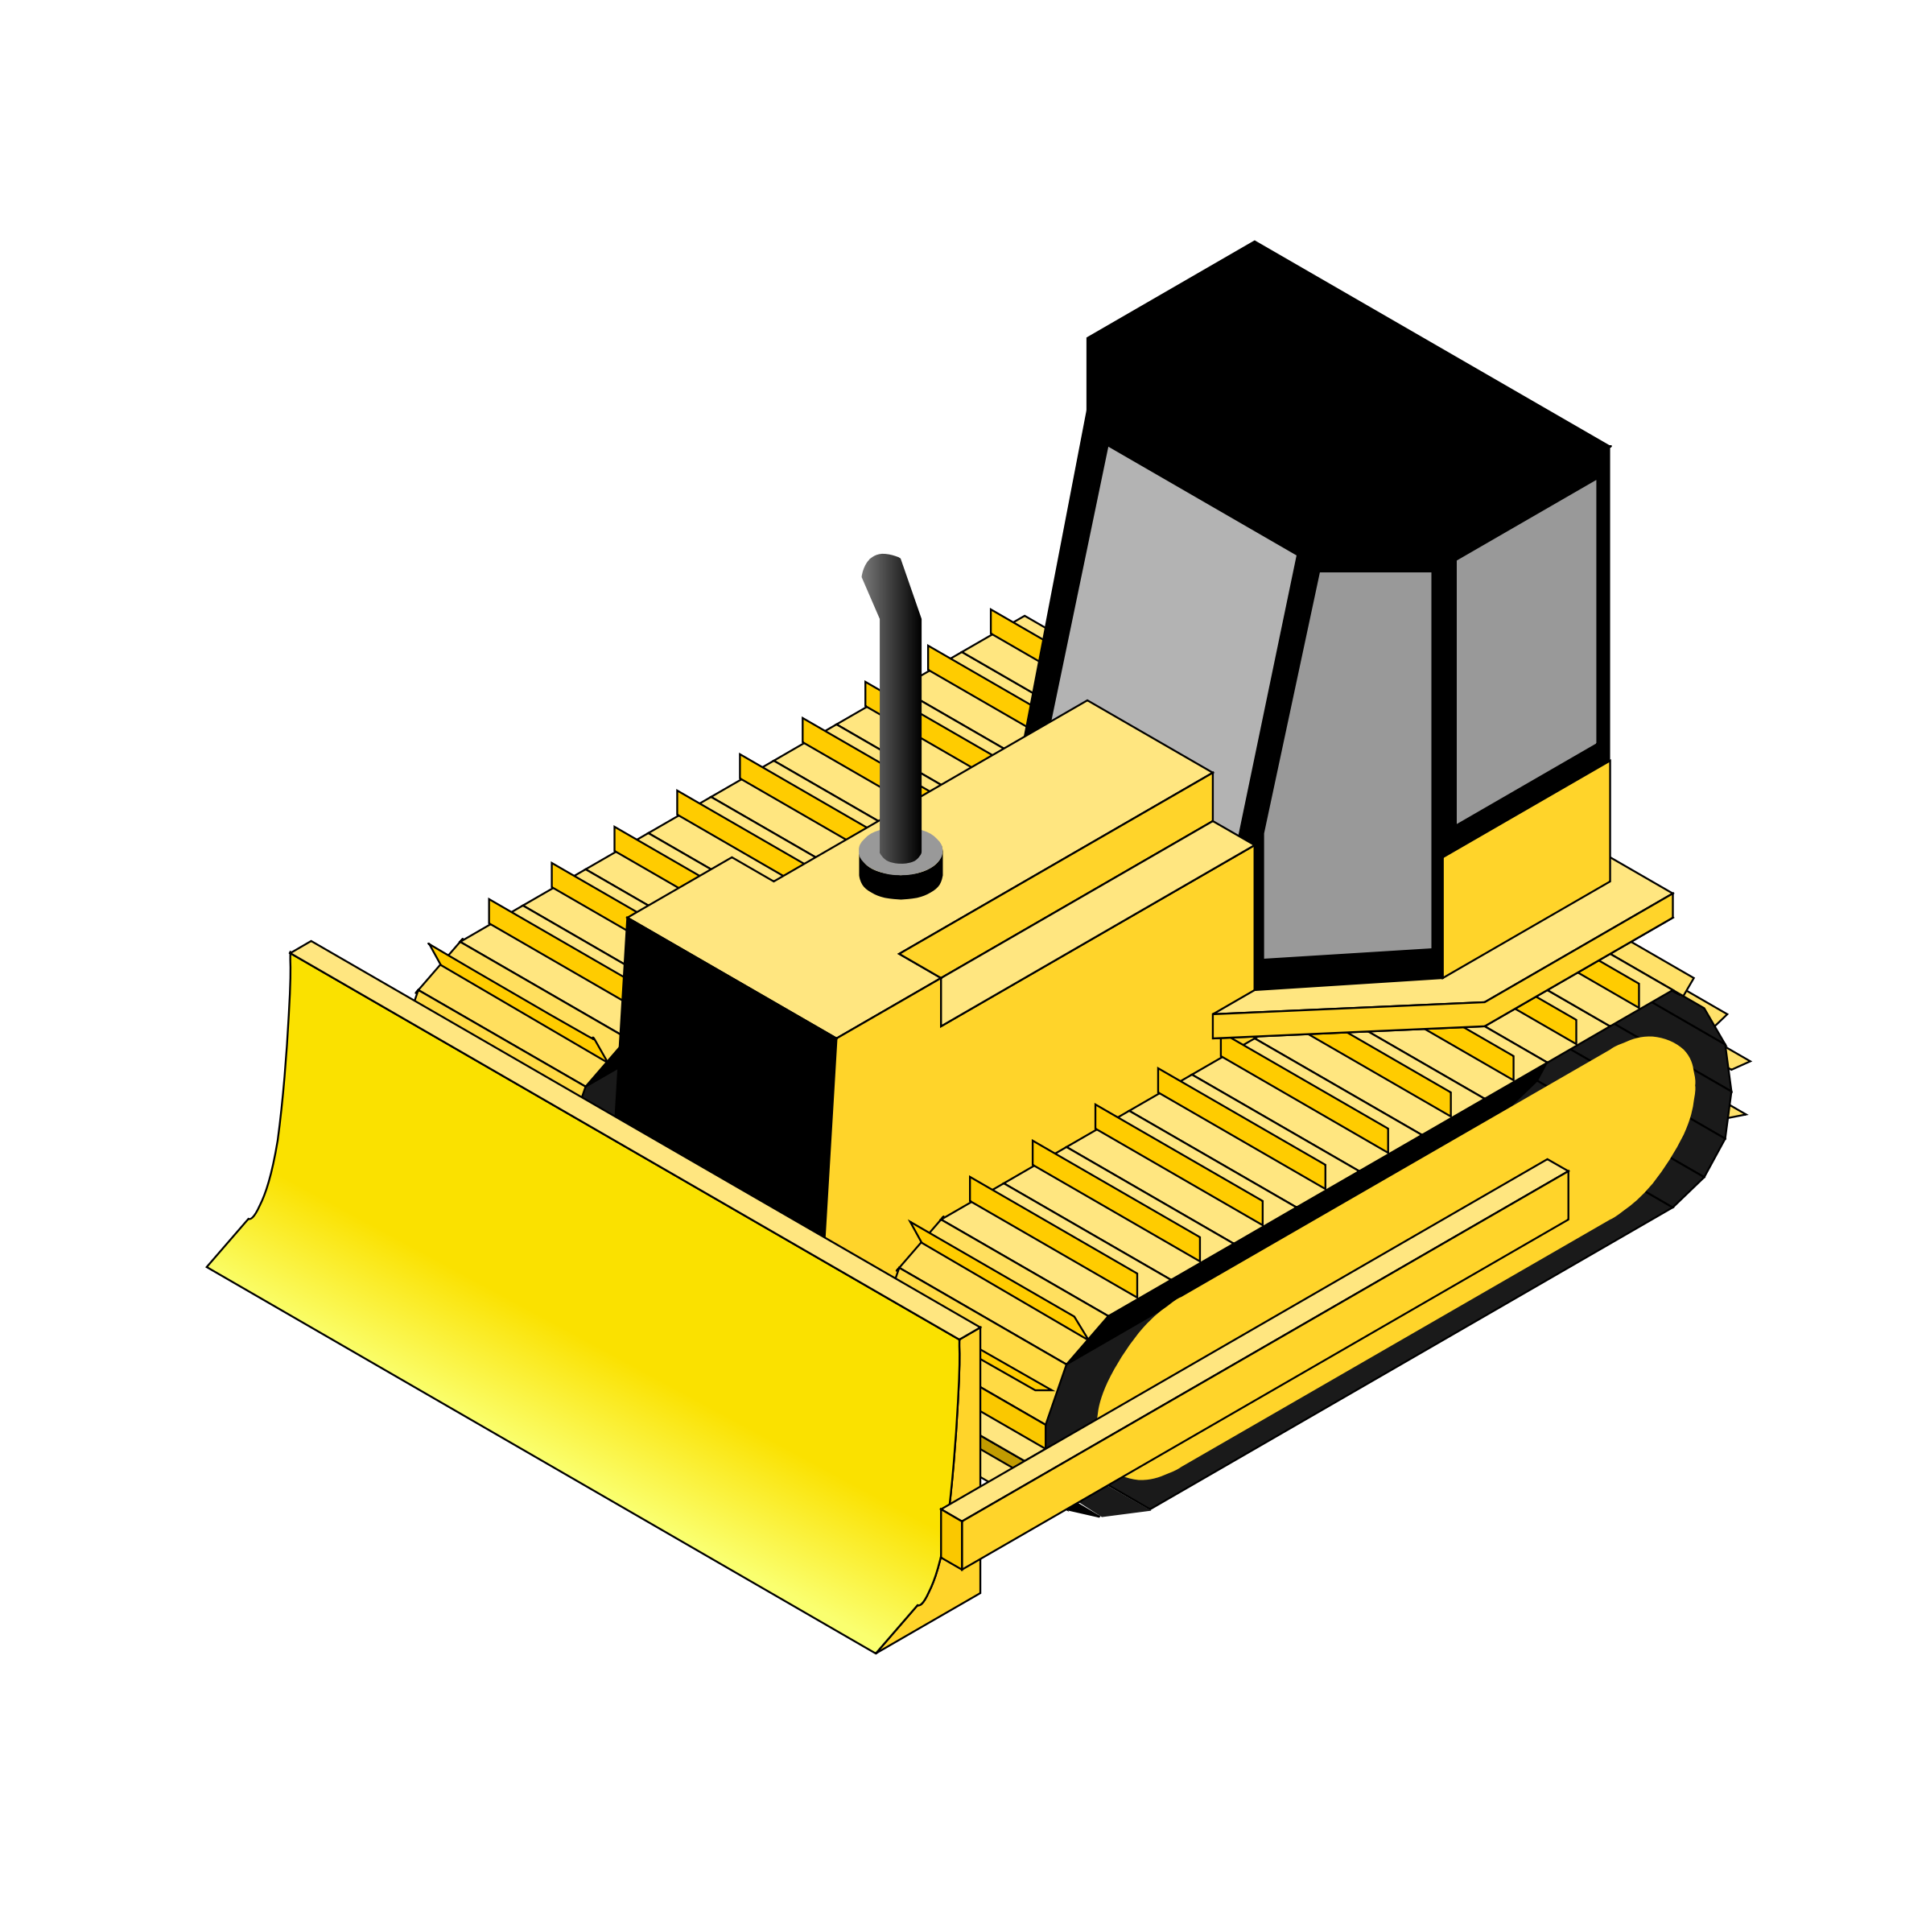 Isometric bulldozer Animation by @danjiro, Animation of a